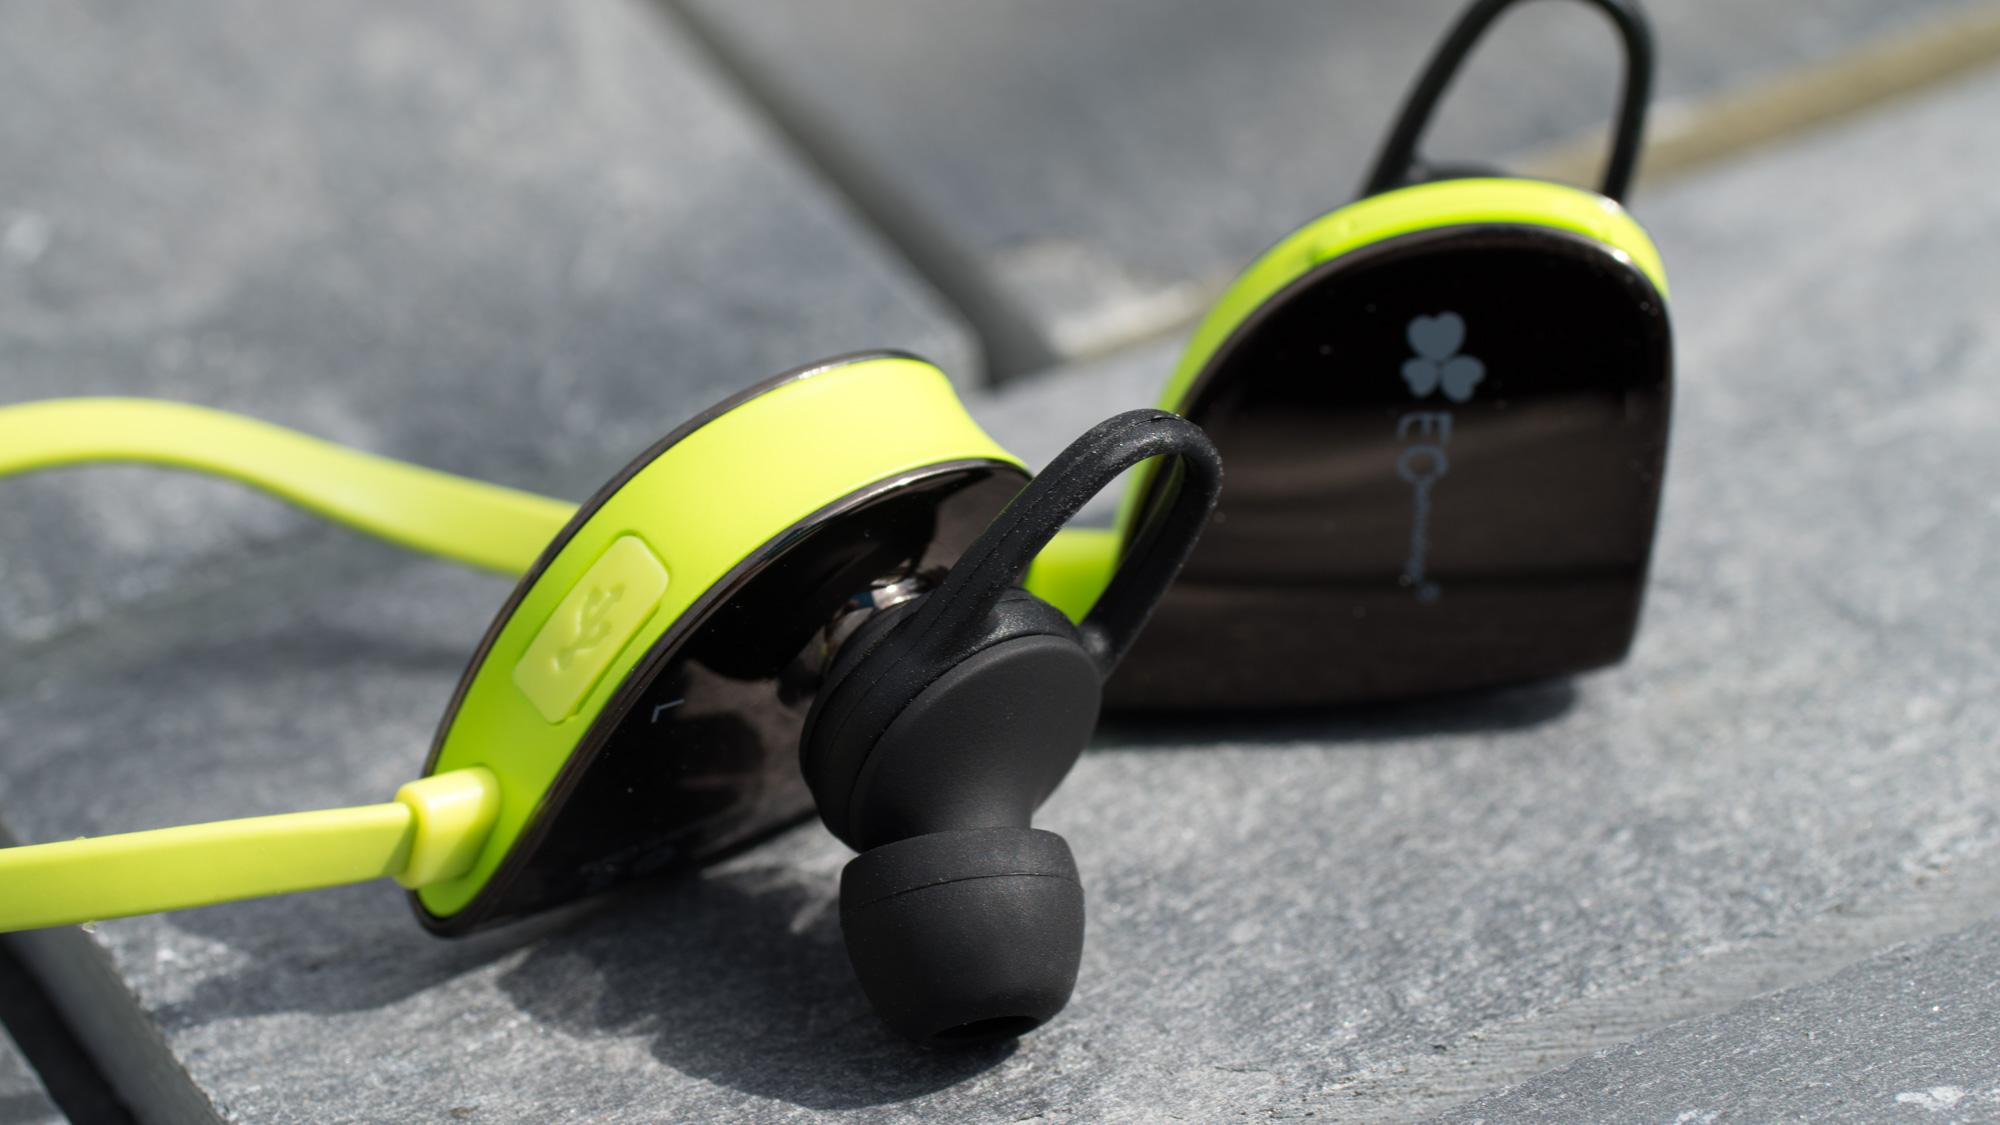 der beste bluetooth sport kopfh rer review der ec technology bluetooth 4 1 wireless in ear. Black Bedroom Furniture Sets. Home Design Ideas